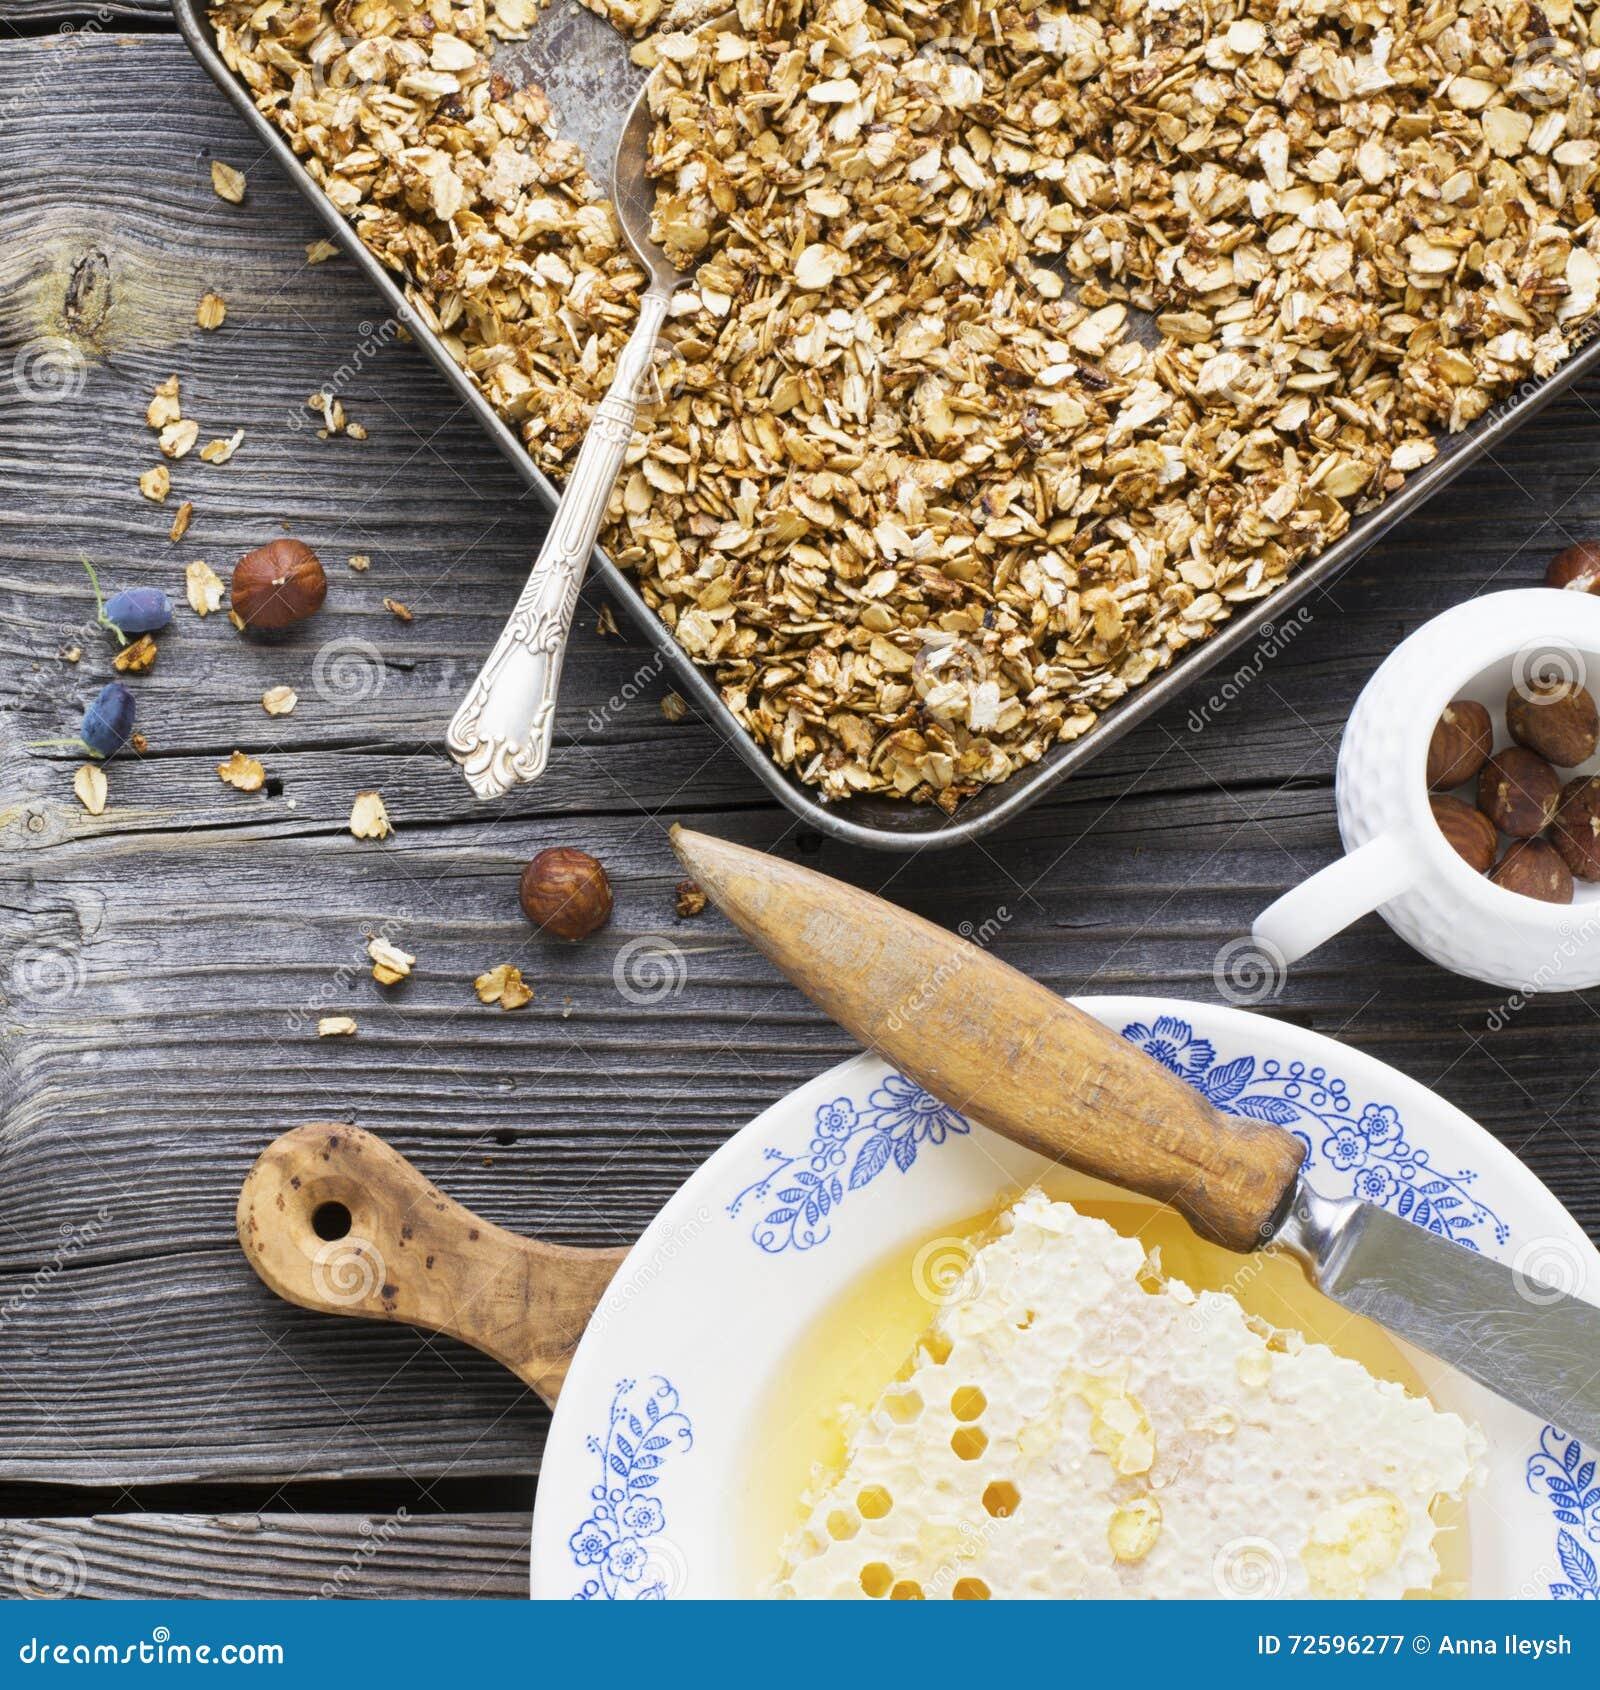 Healthy Breakfast. Honey Crisp Flavorful Granola With Nuts